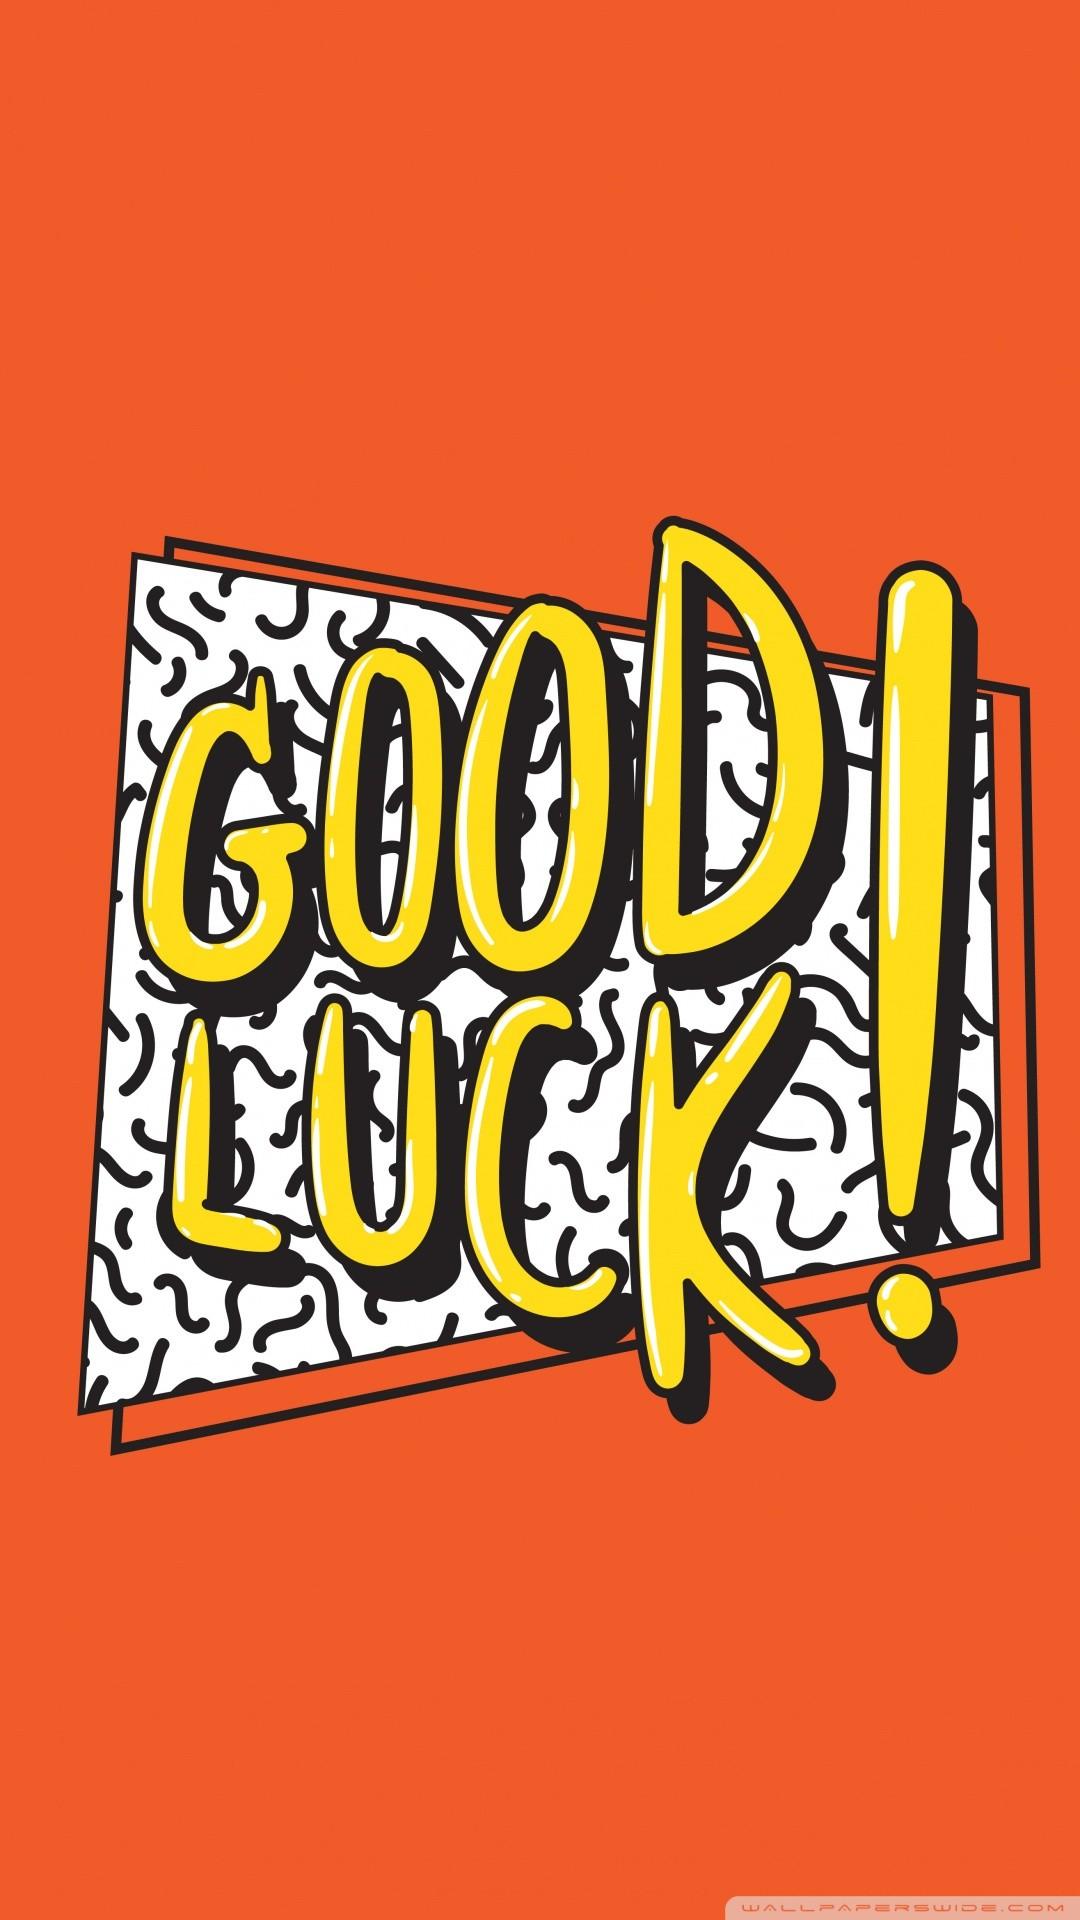 Free Good Luck phone wallpaper by luvmykids0114